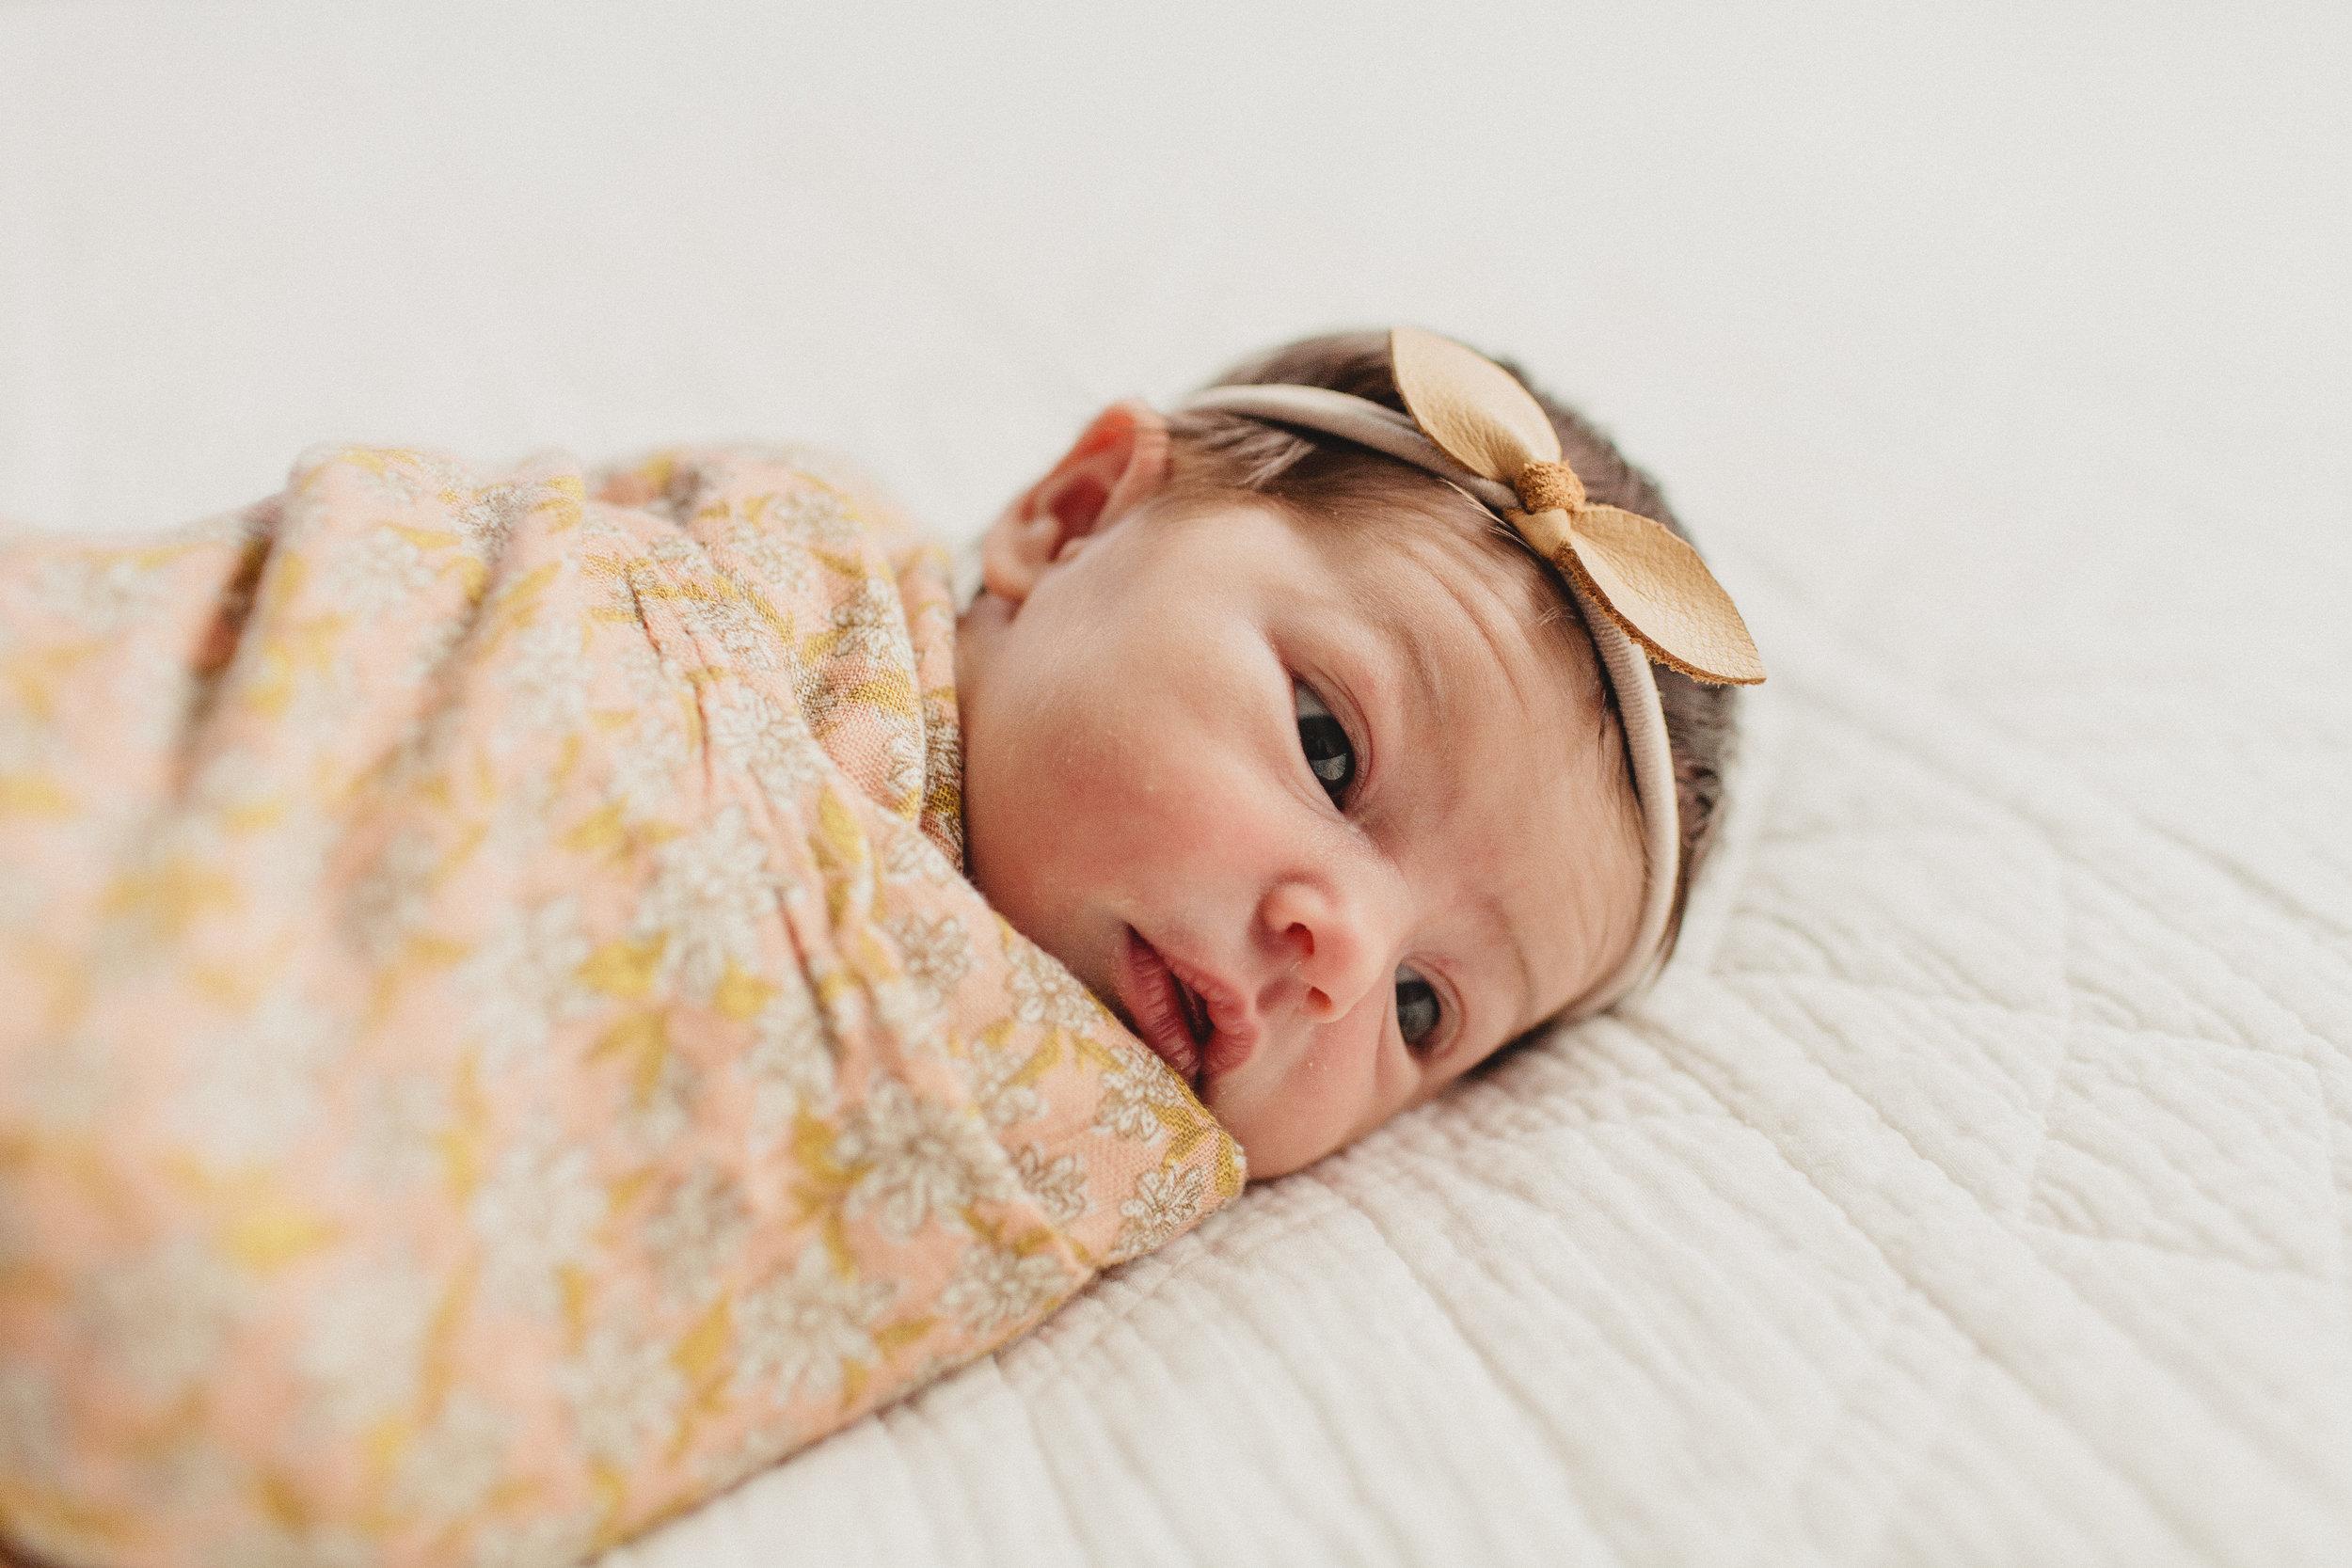 Baby Emilia Renee Thorum 12.11.17-1.jpg